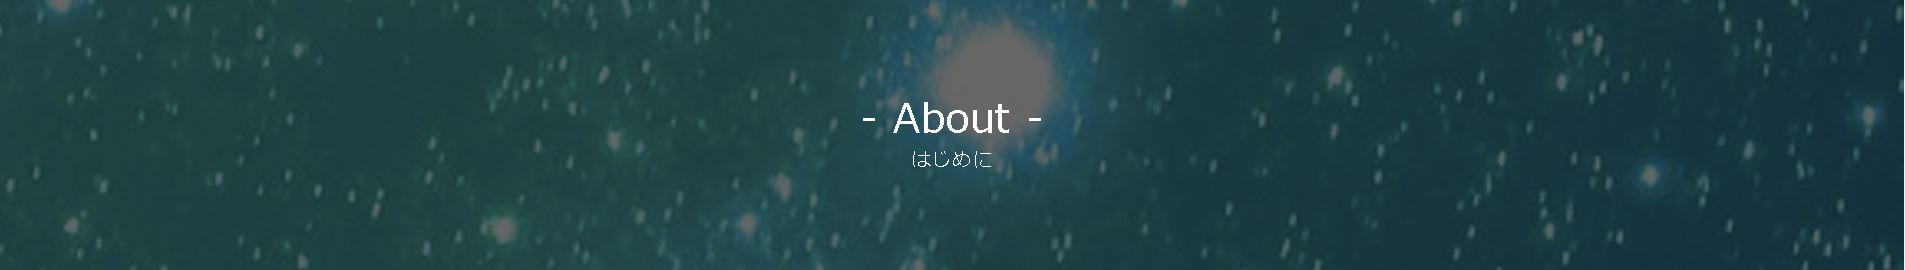 "alt=""ザハ・ハディド東京オペラシティアートギャラリー"""